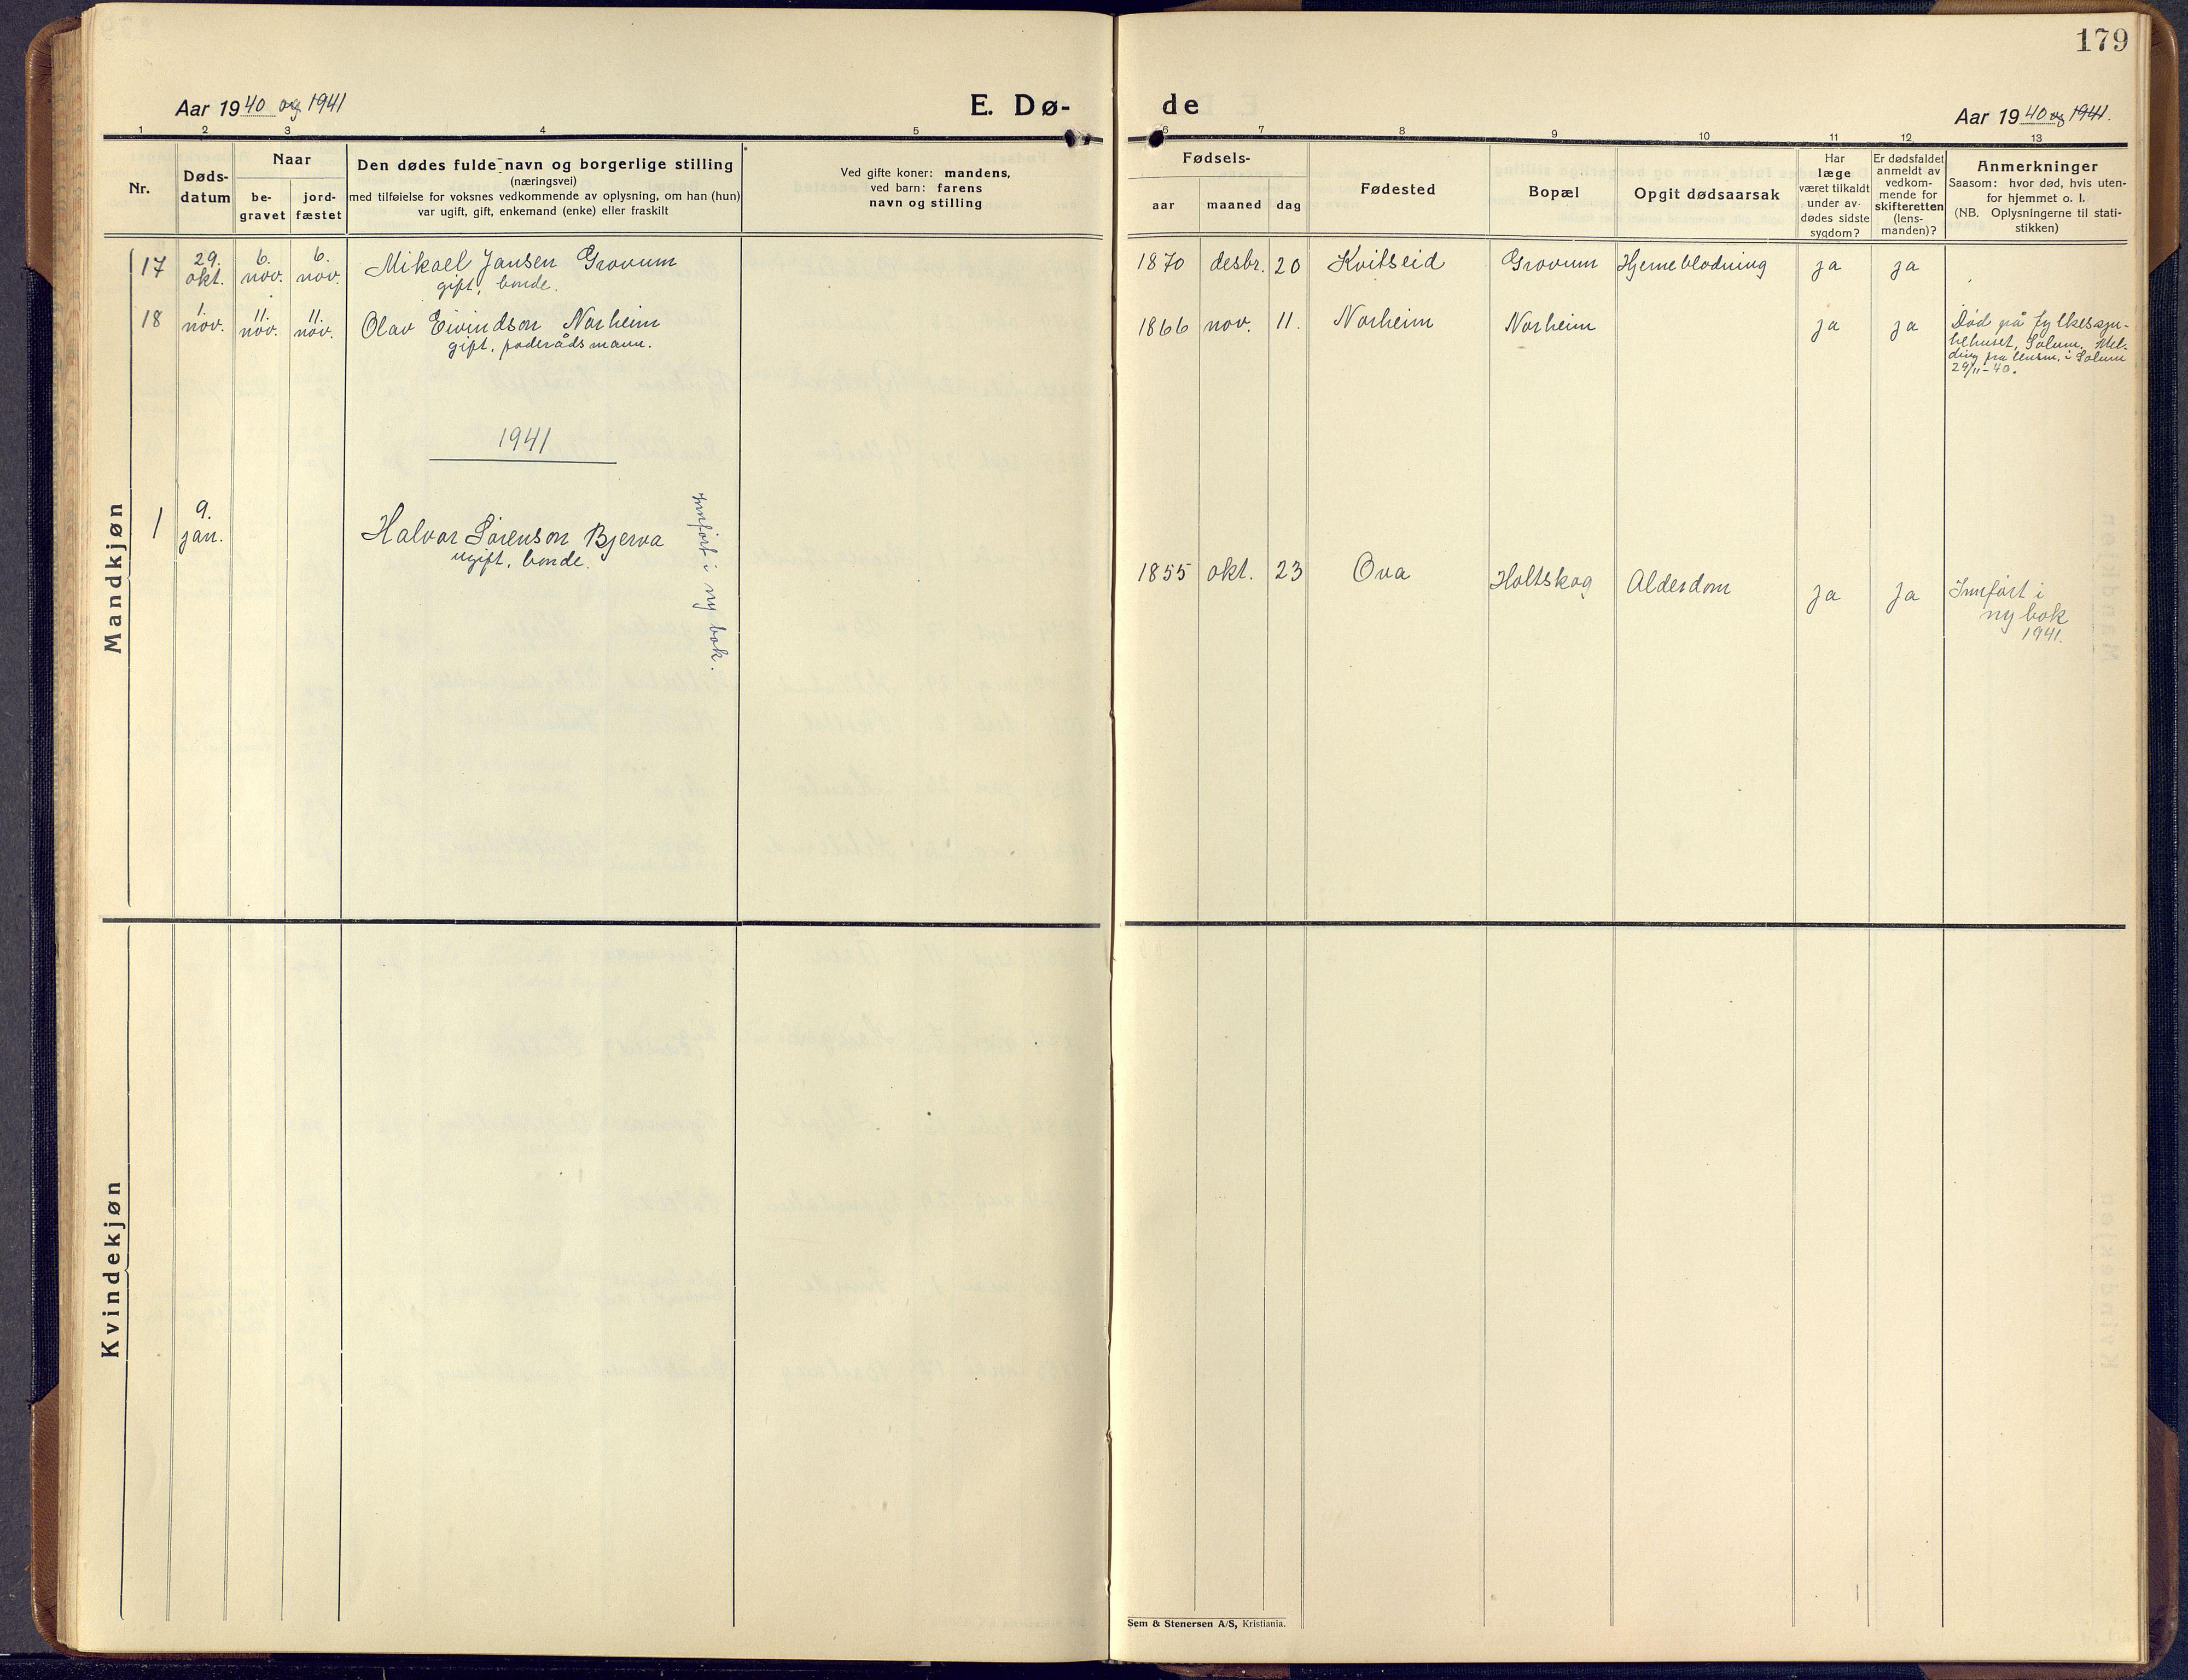 SAKO, Lunde kirkebøker, F/Fa/L0006: Ministerialbok nr. I 6, 1922-1940, s. 179